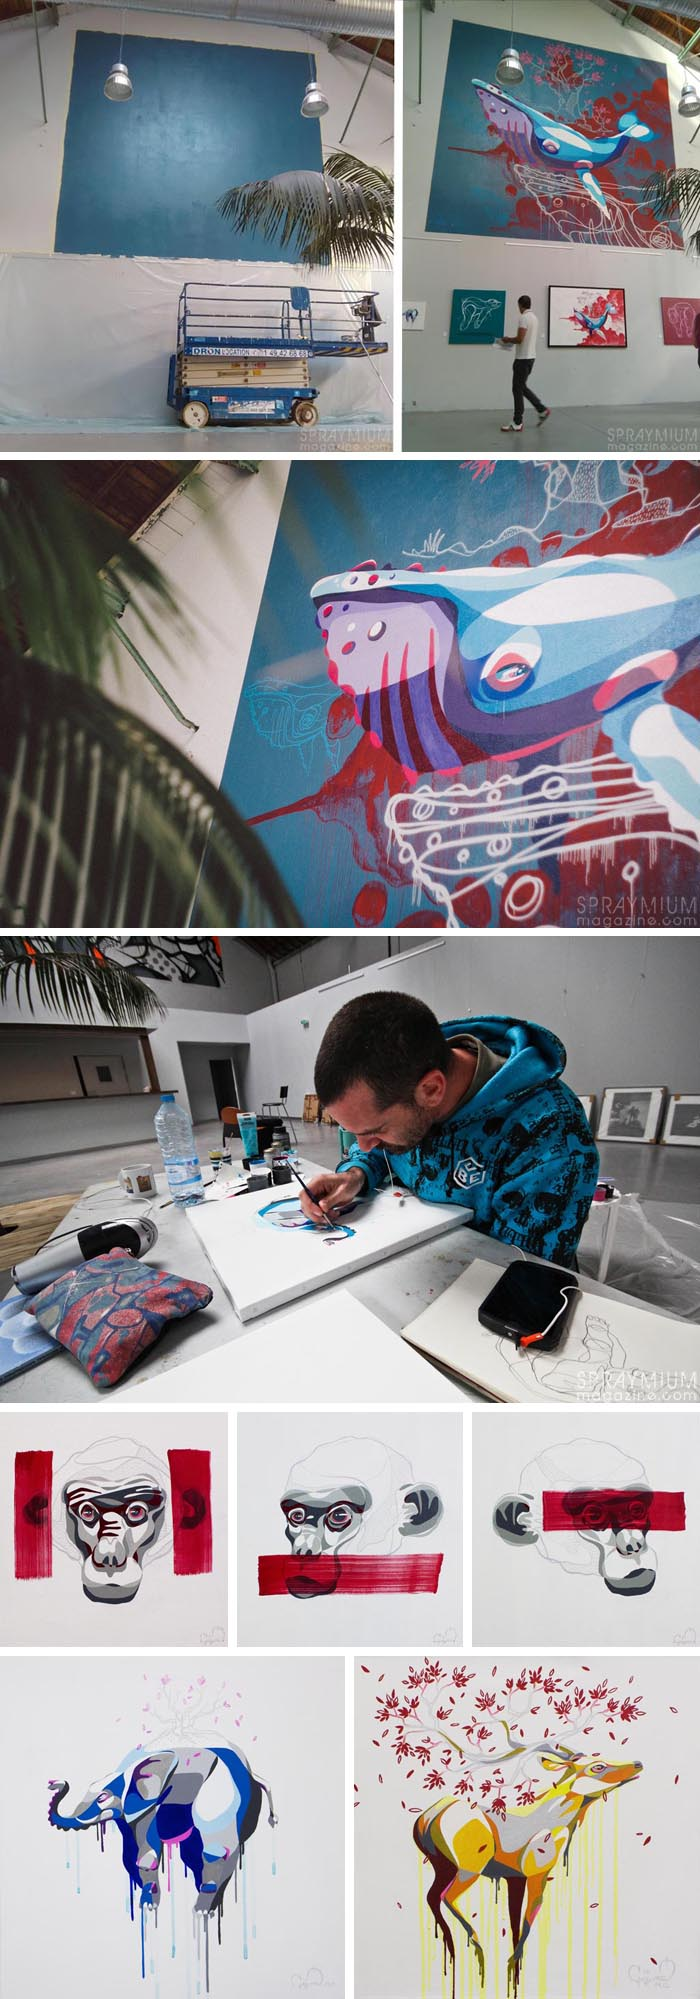 exposition mister freeze toulouse art urbain contemporain graffiti postgraffiti streetart muralism spraymium gorg